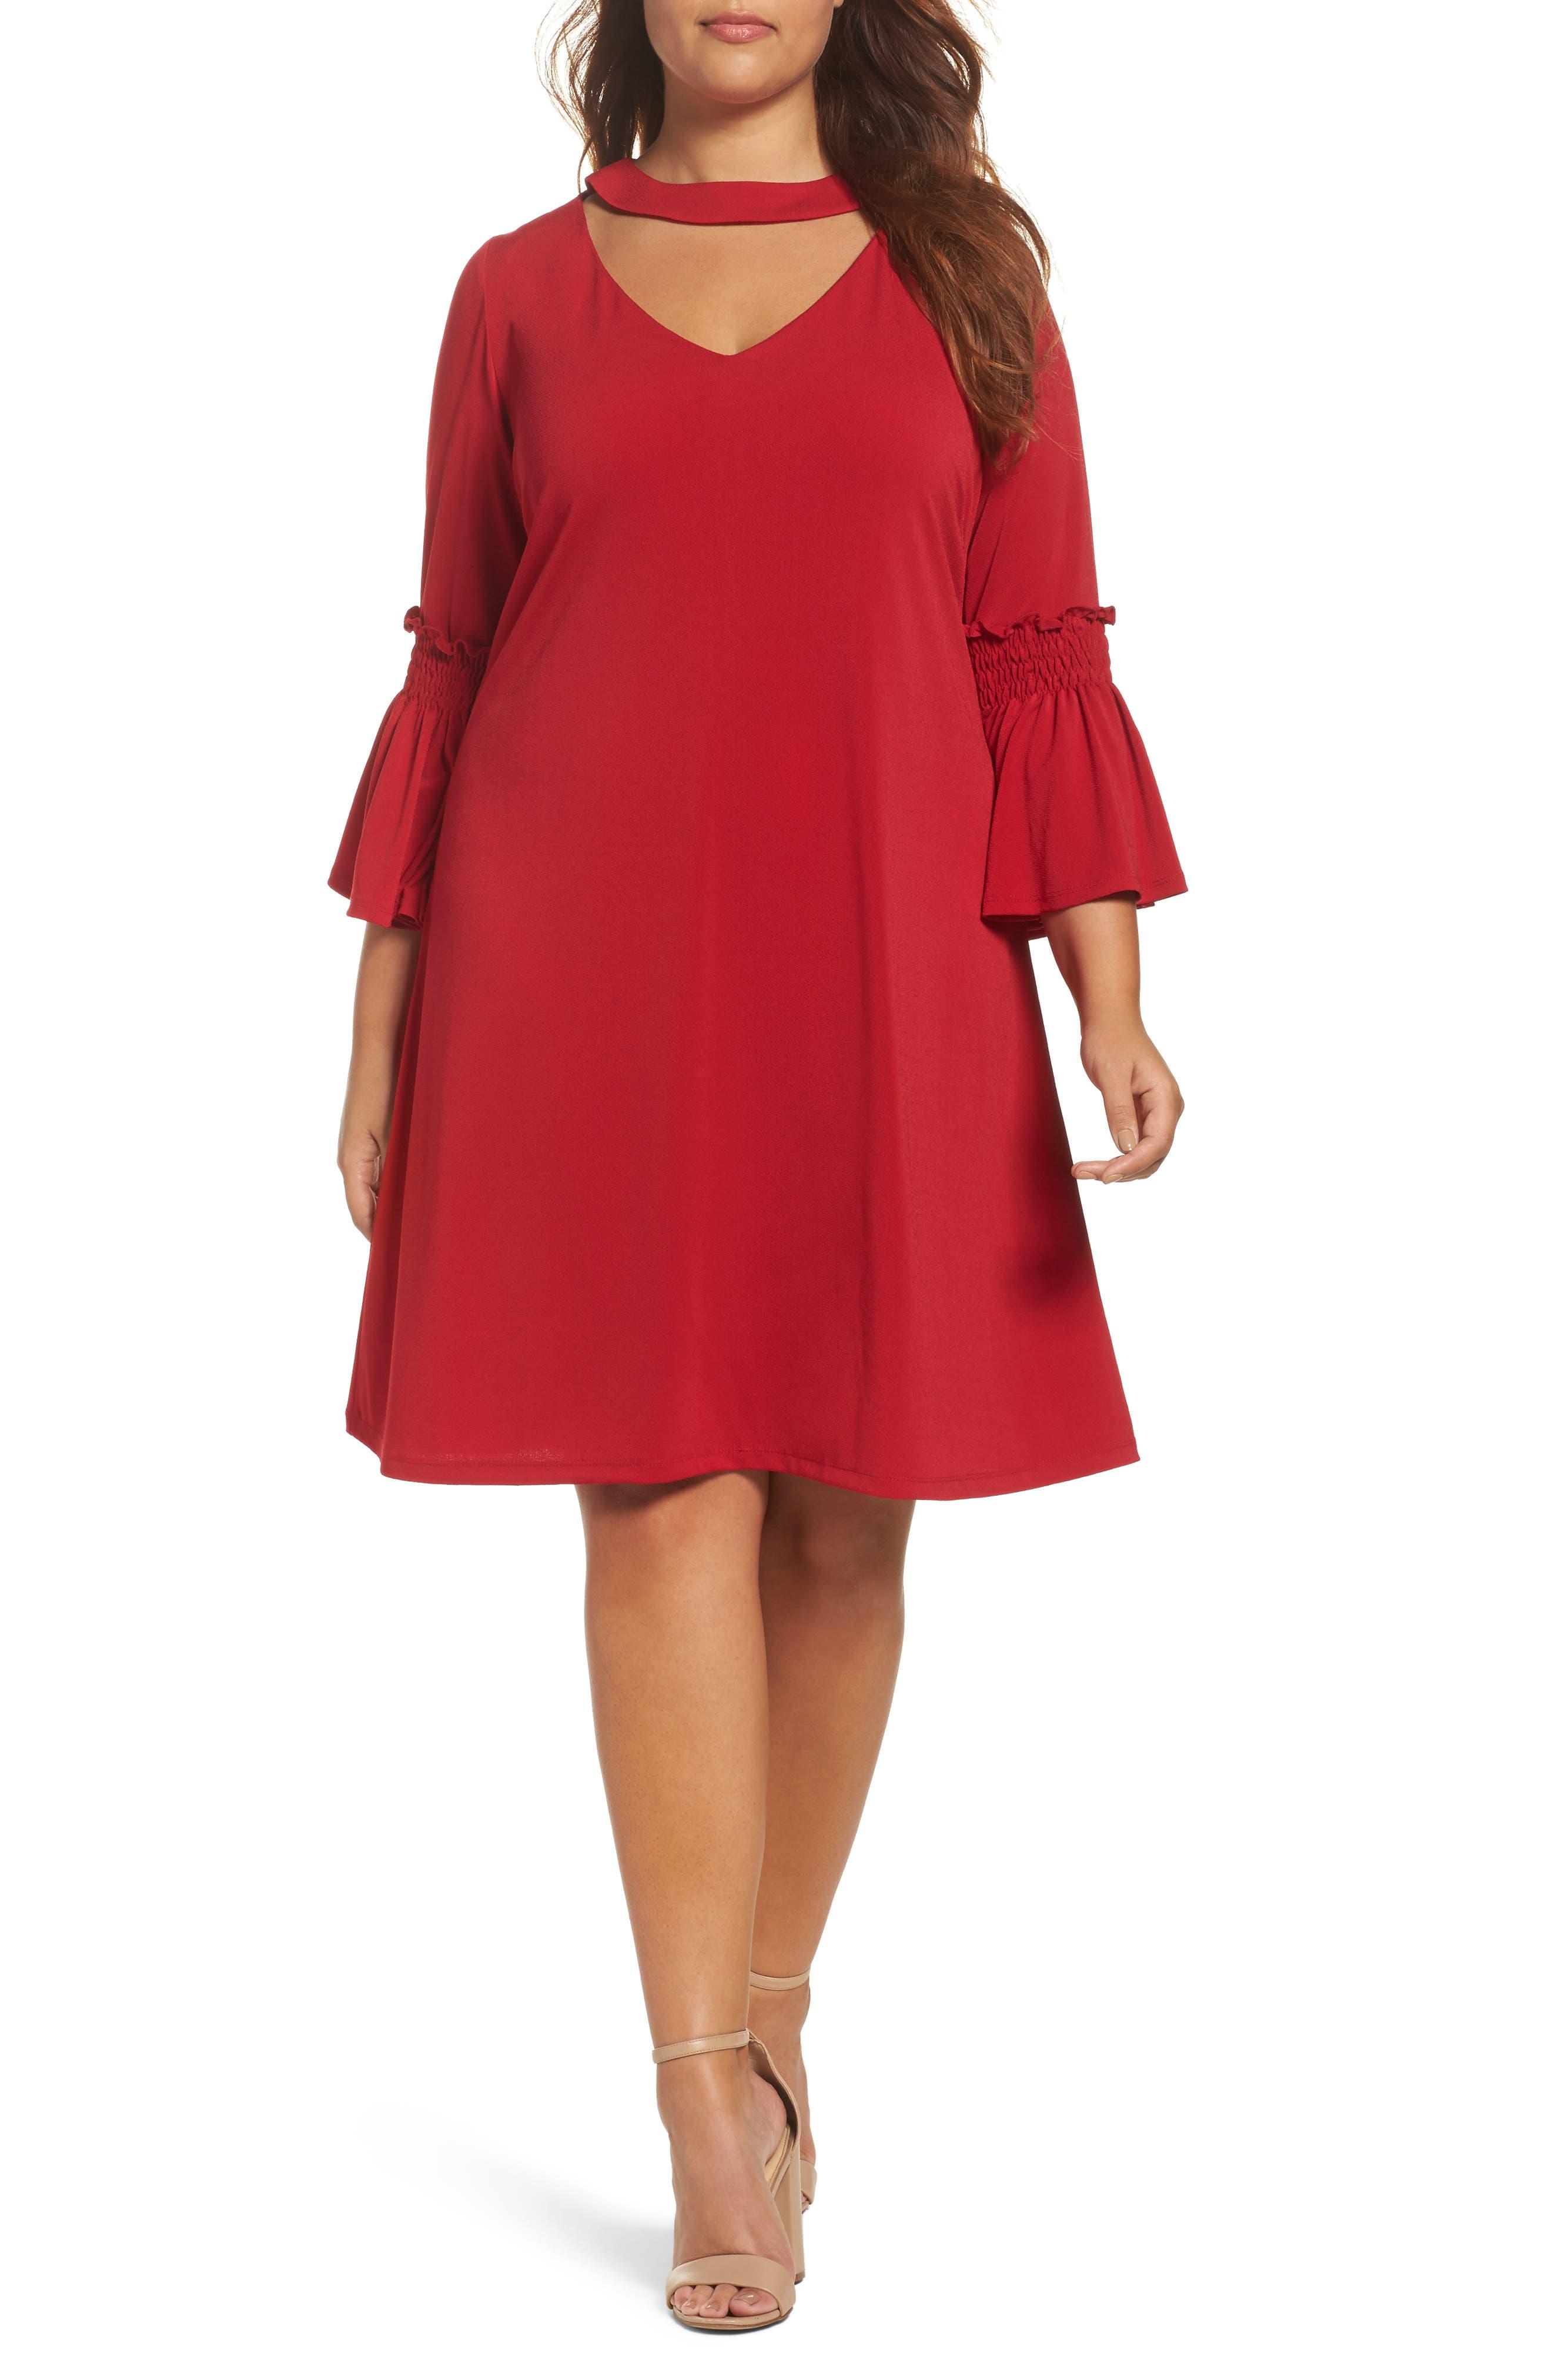 Main Image - Gabby Skye Bell Sleeve A-Line Choker Dress (Plus Size)